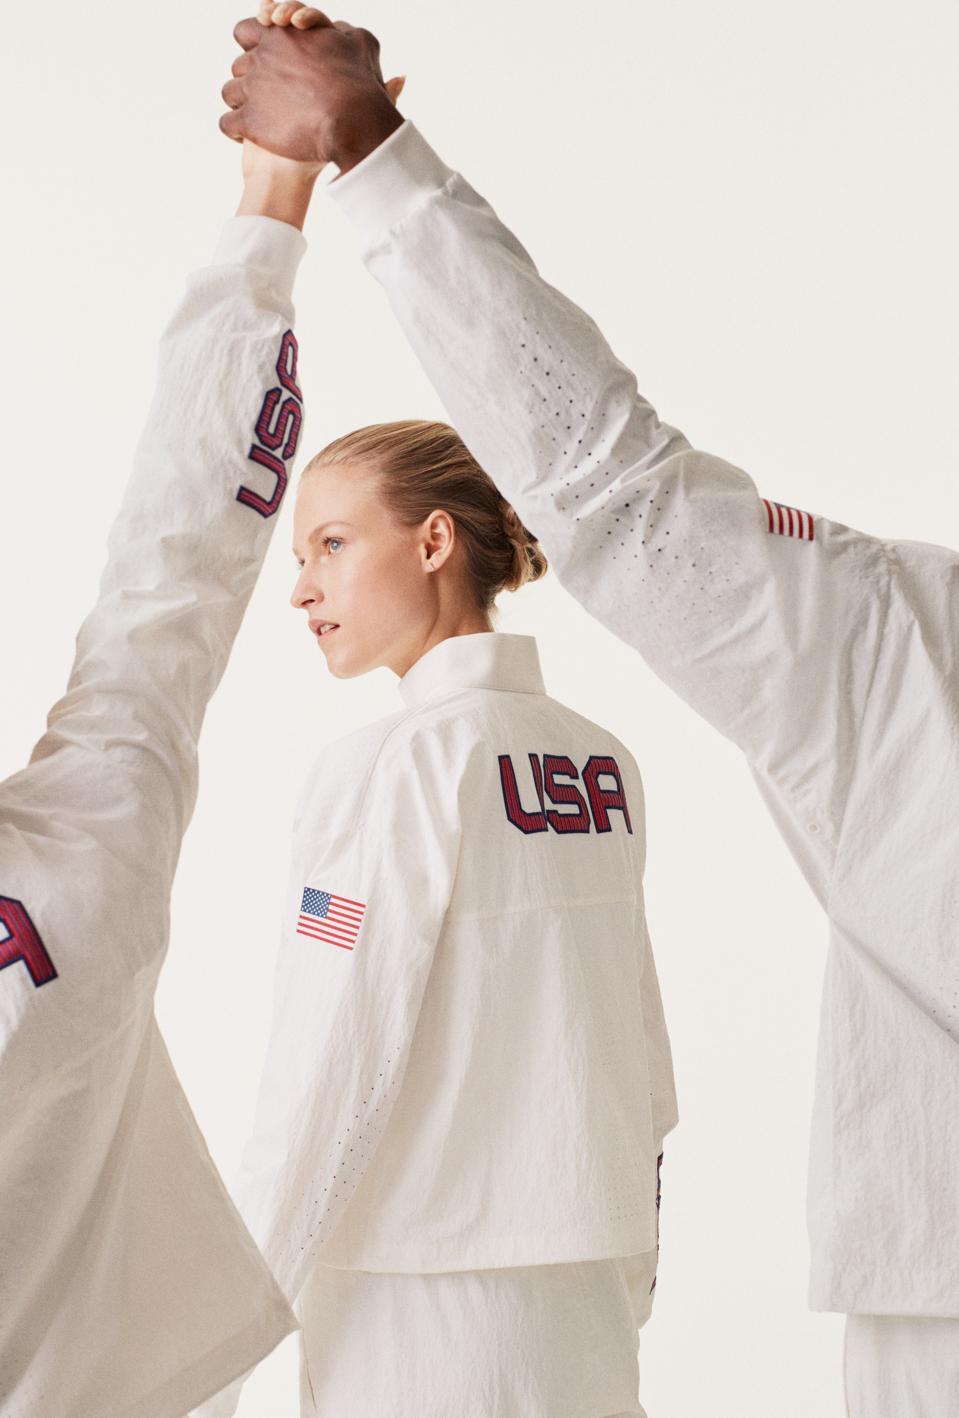 Nike's 2020 Olympics uniforms